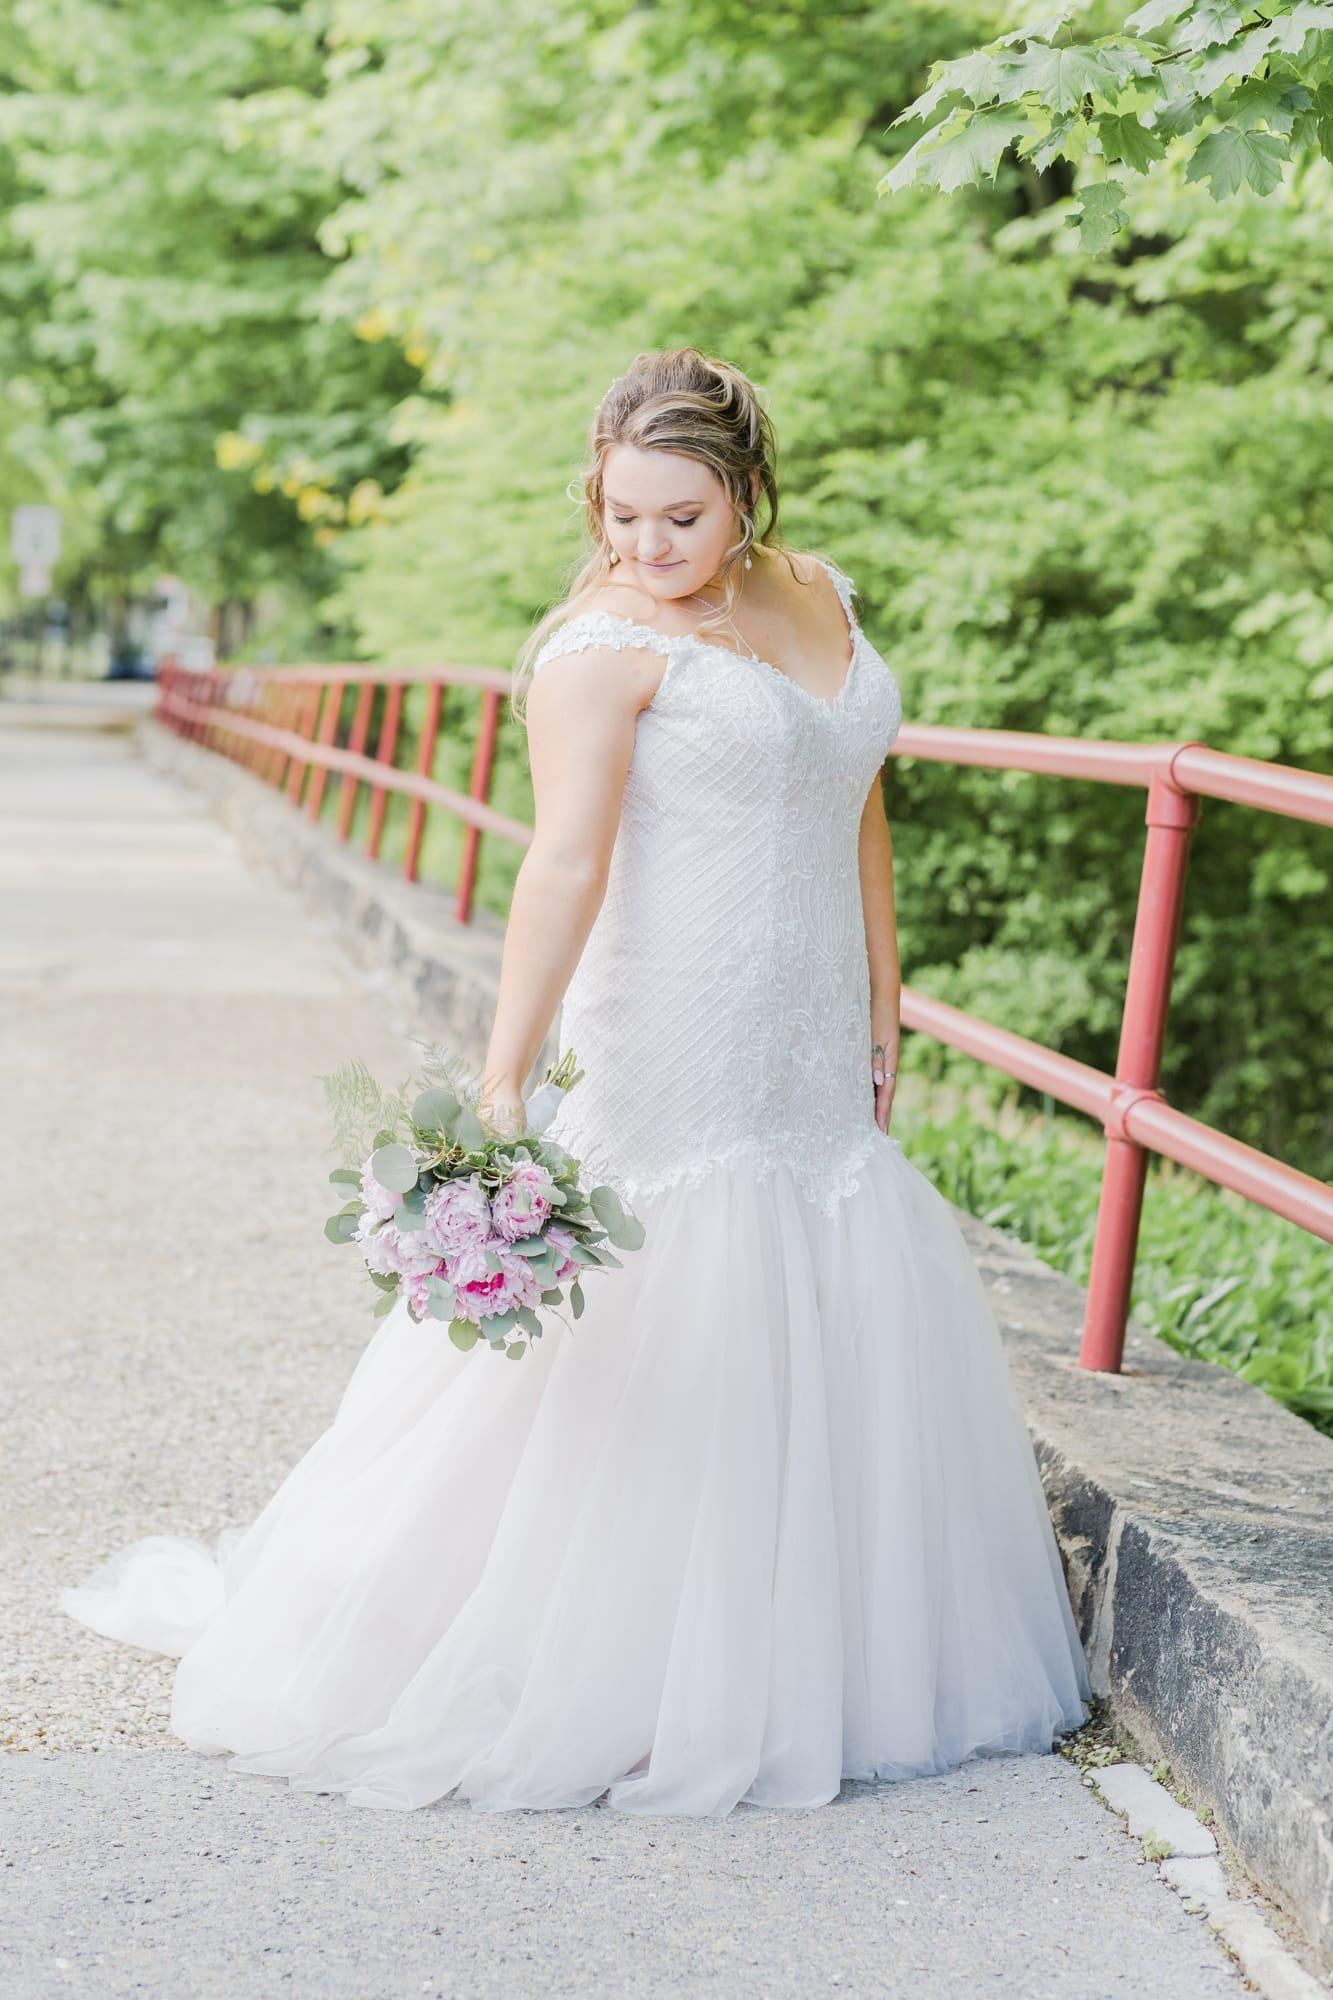 Central Pennsylvania PA summer wedding bridal portrait